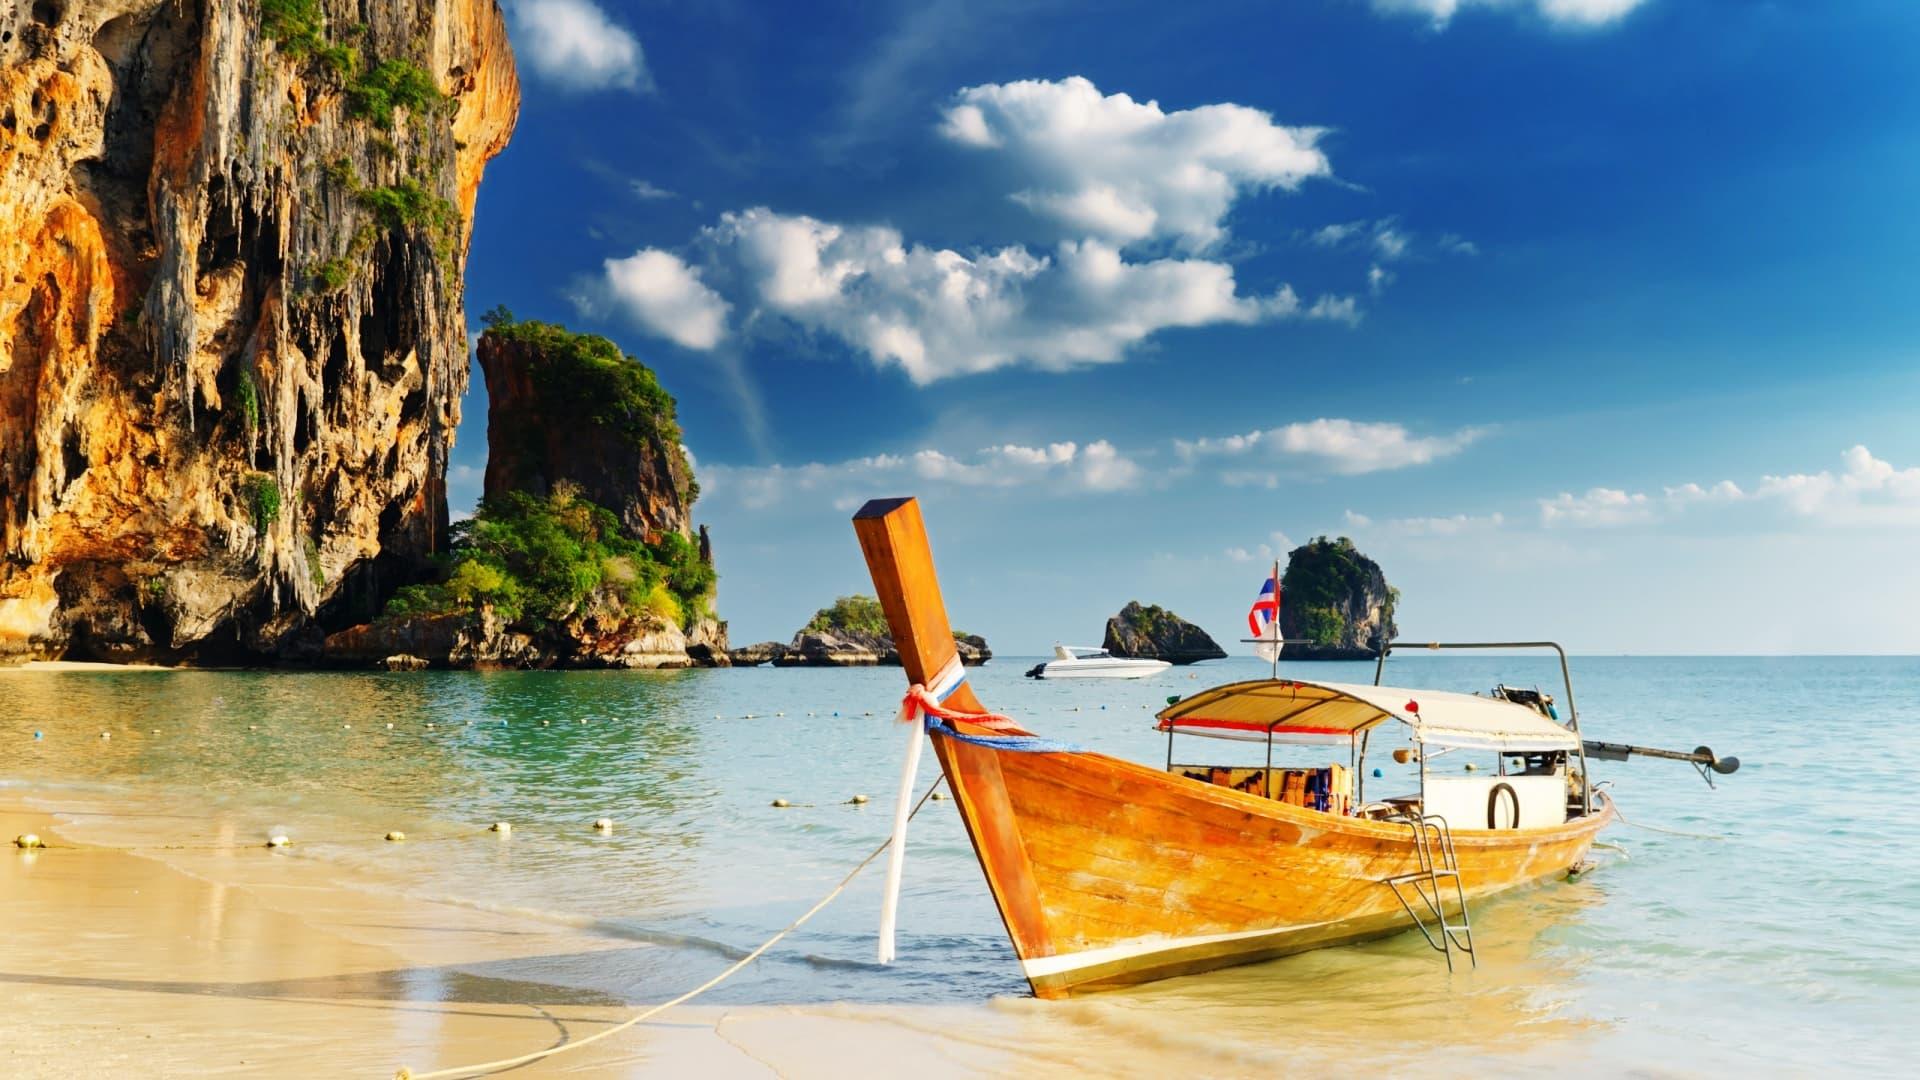 тайланд фото для рабочего стола